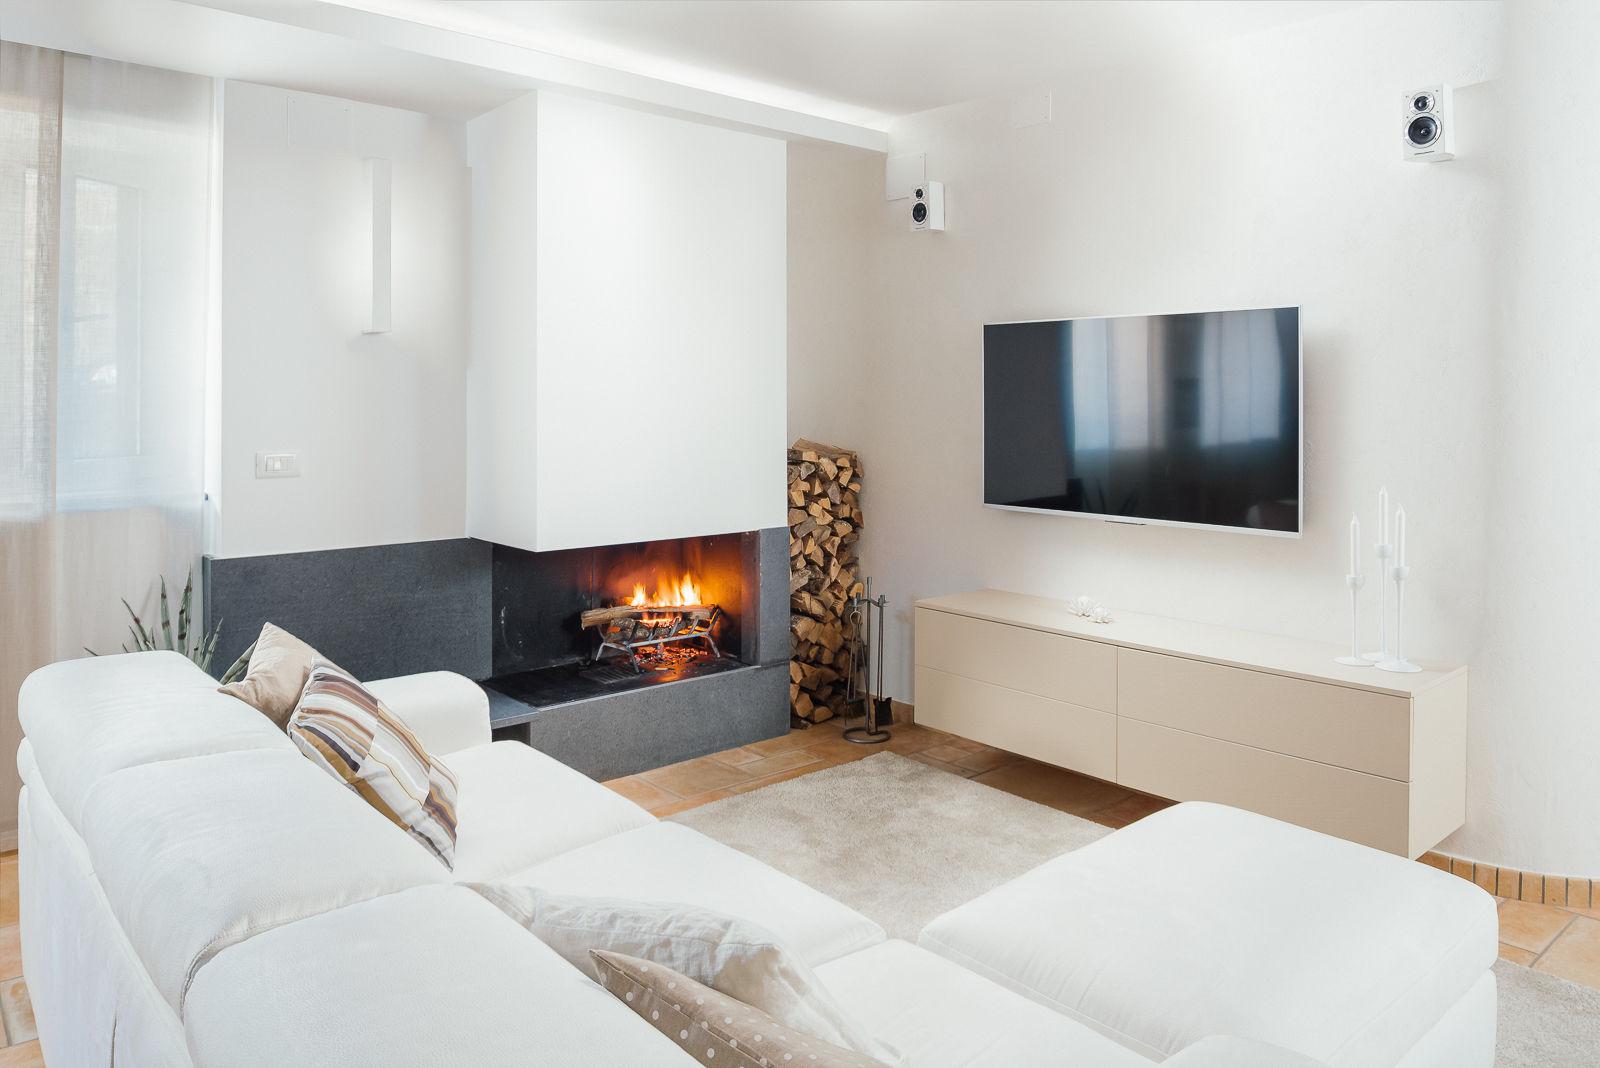 Ben noto Idee Arredamento Casa & Interior Design | homify NC52